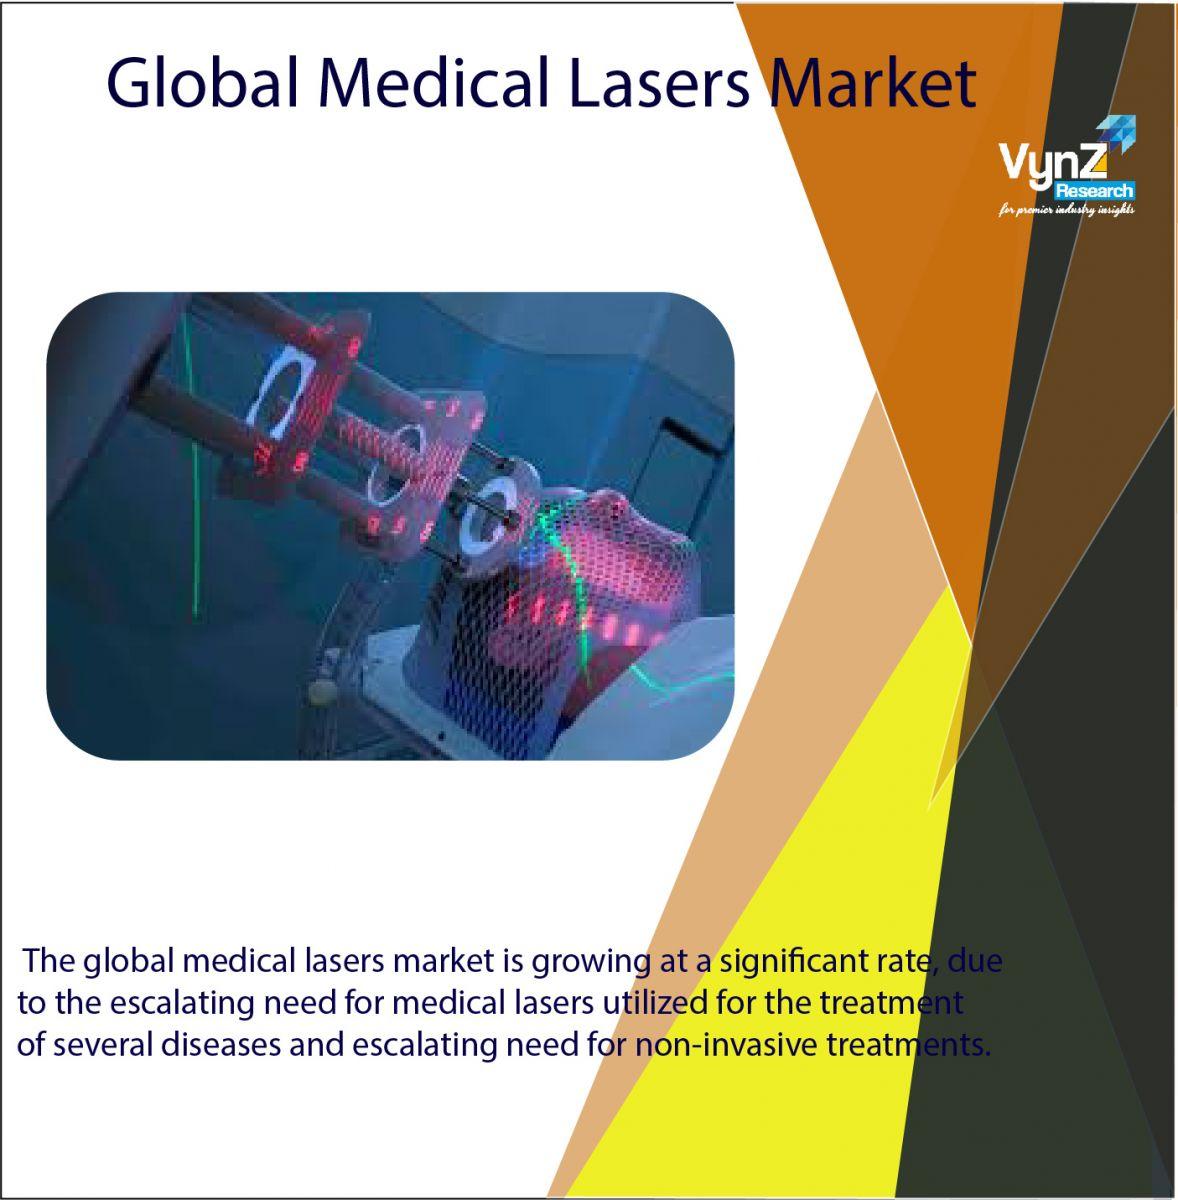 Medical Lasers Market Highlights